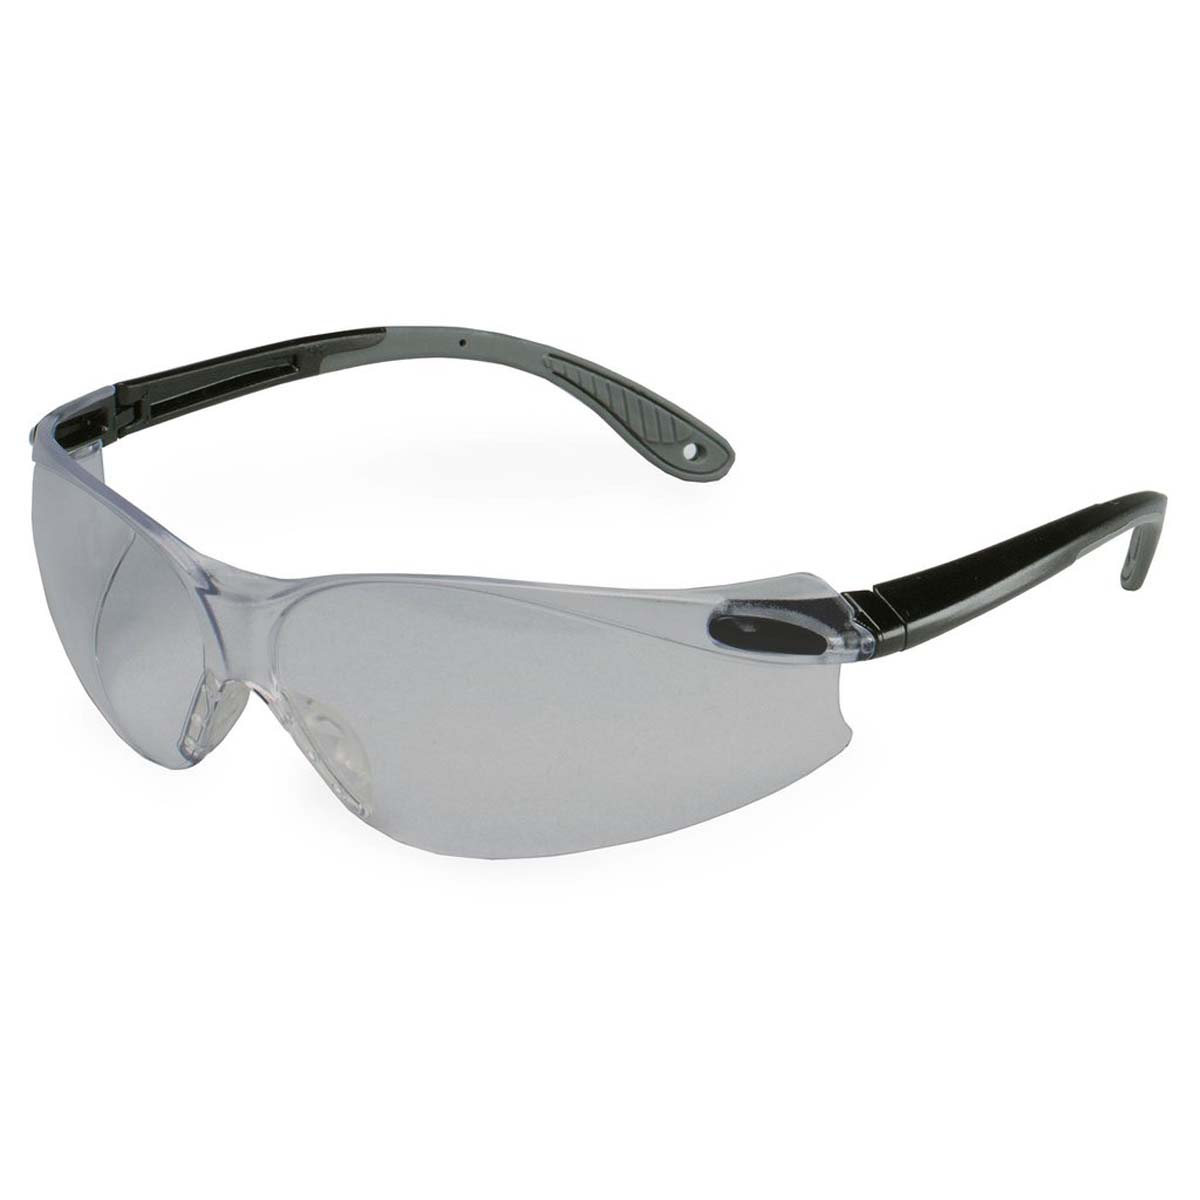 3M Virtua V4 Protective Eyewear 11673-00000-20 Gray Anti-Fog Lens, Black/Gray Temple